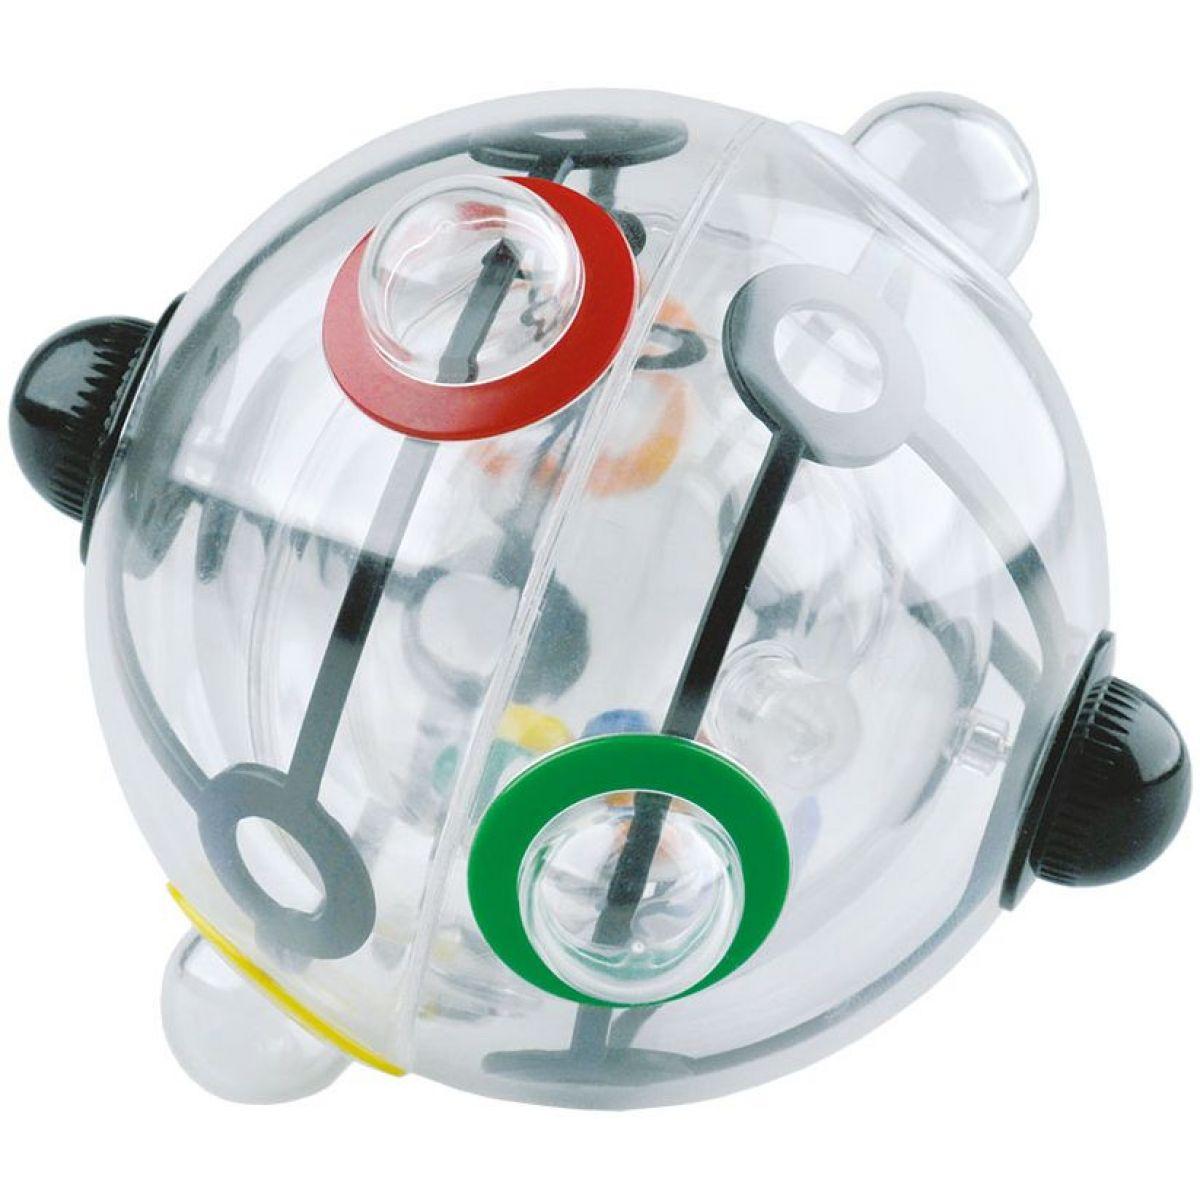 Toy 500702 - Rubikova koule